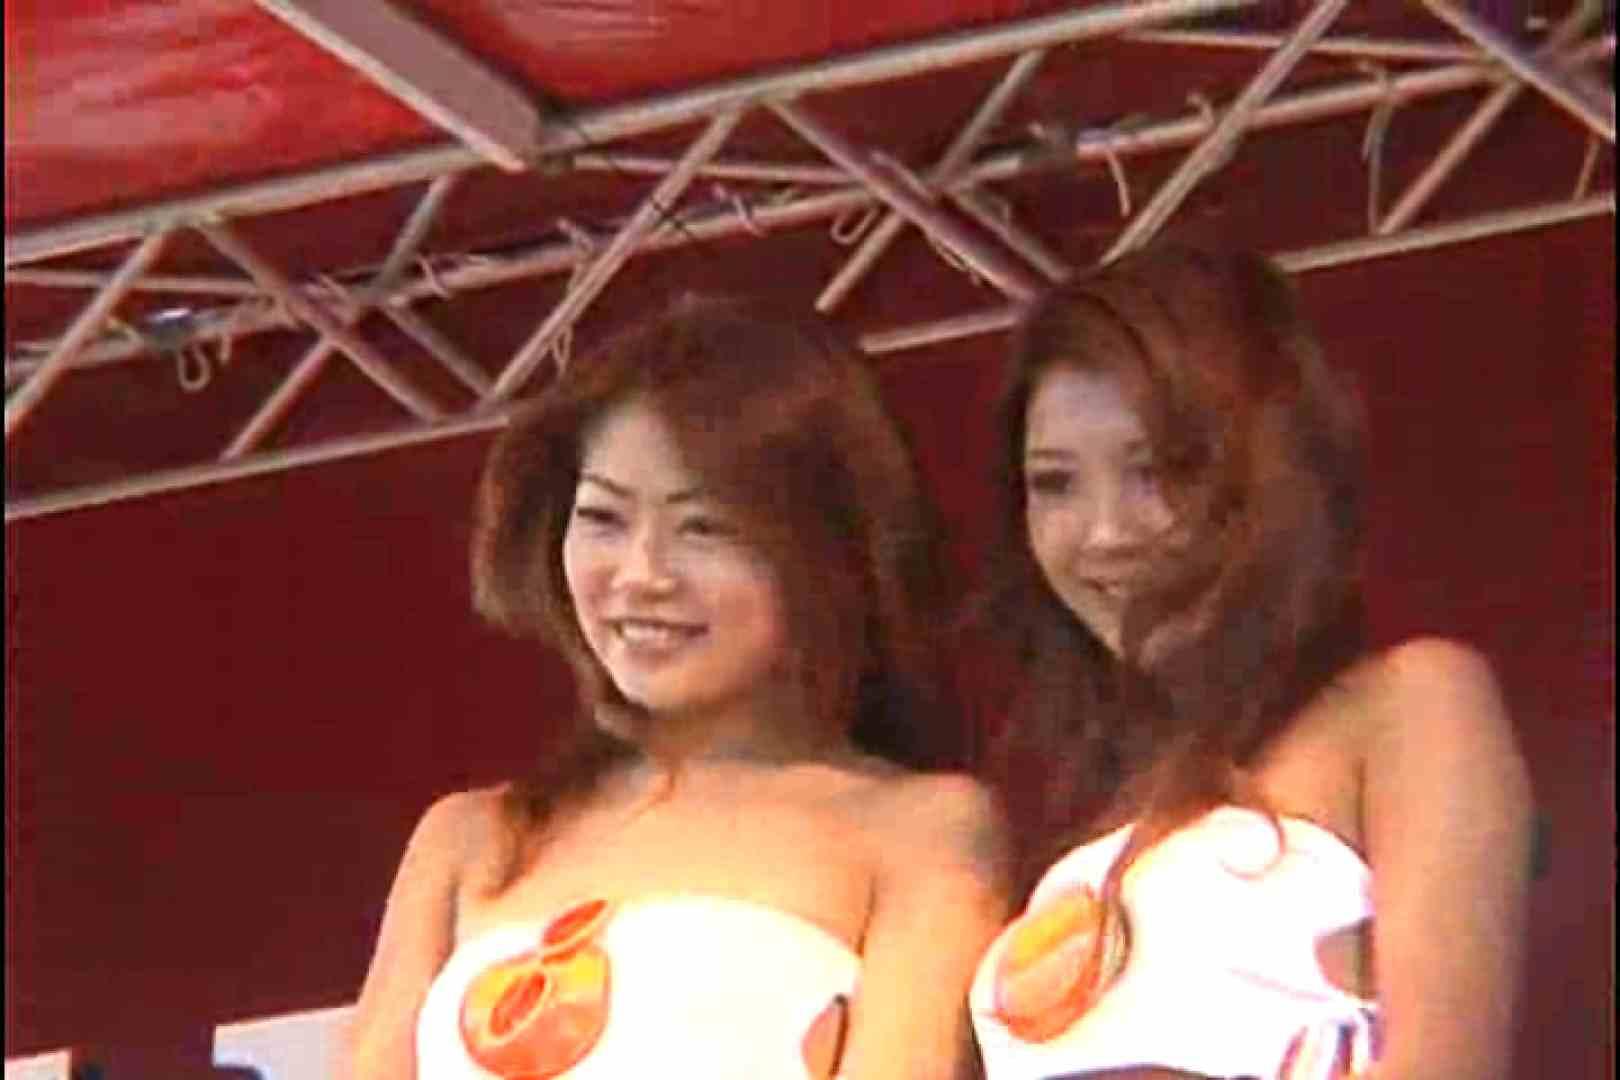 RQカメラ地獄Vol.10 乳首   OL女体  74連発 25